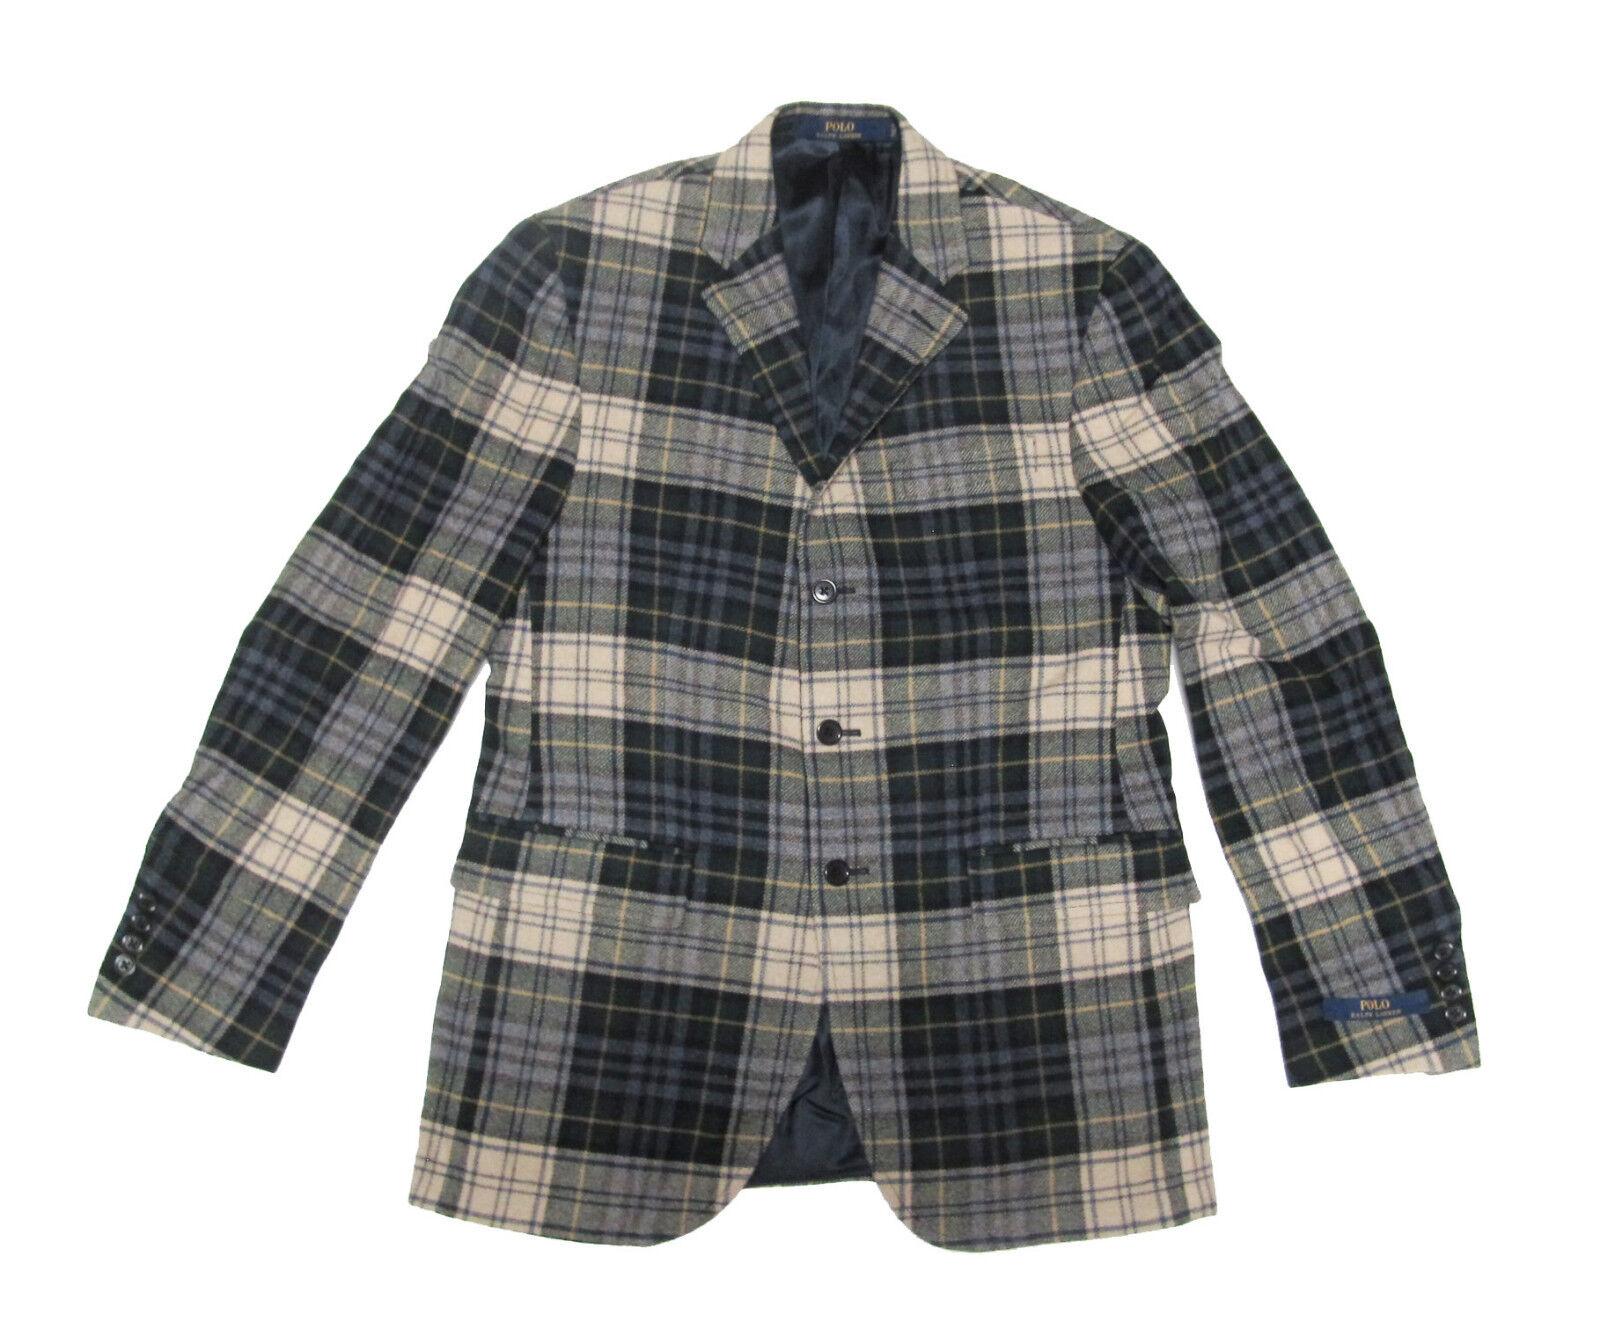 Polo Ralph Lauren herren  Winter wolleCashmere Plaid Sportcoat Blazer jacke